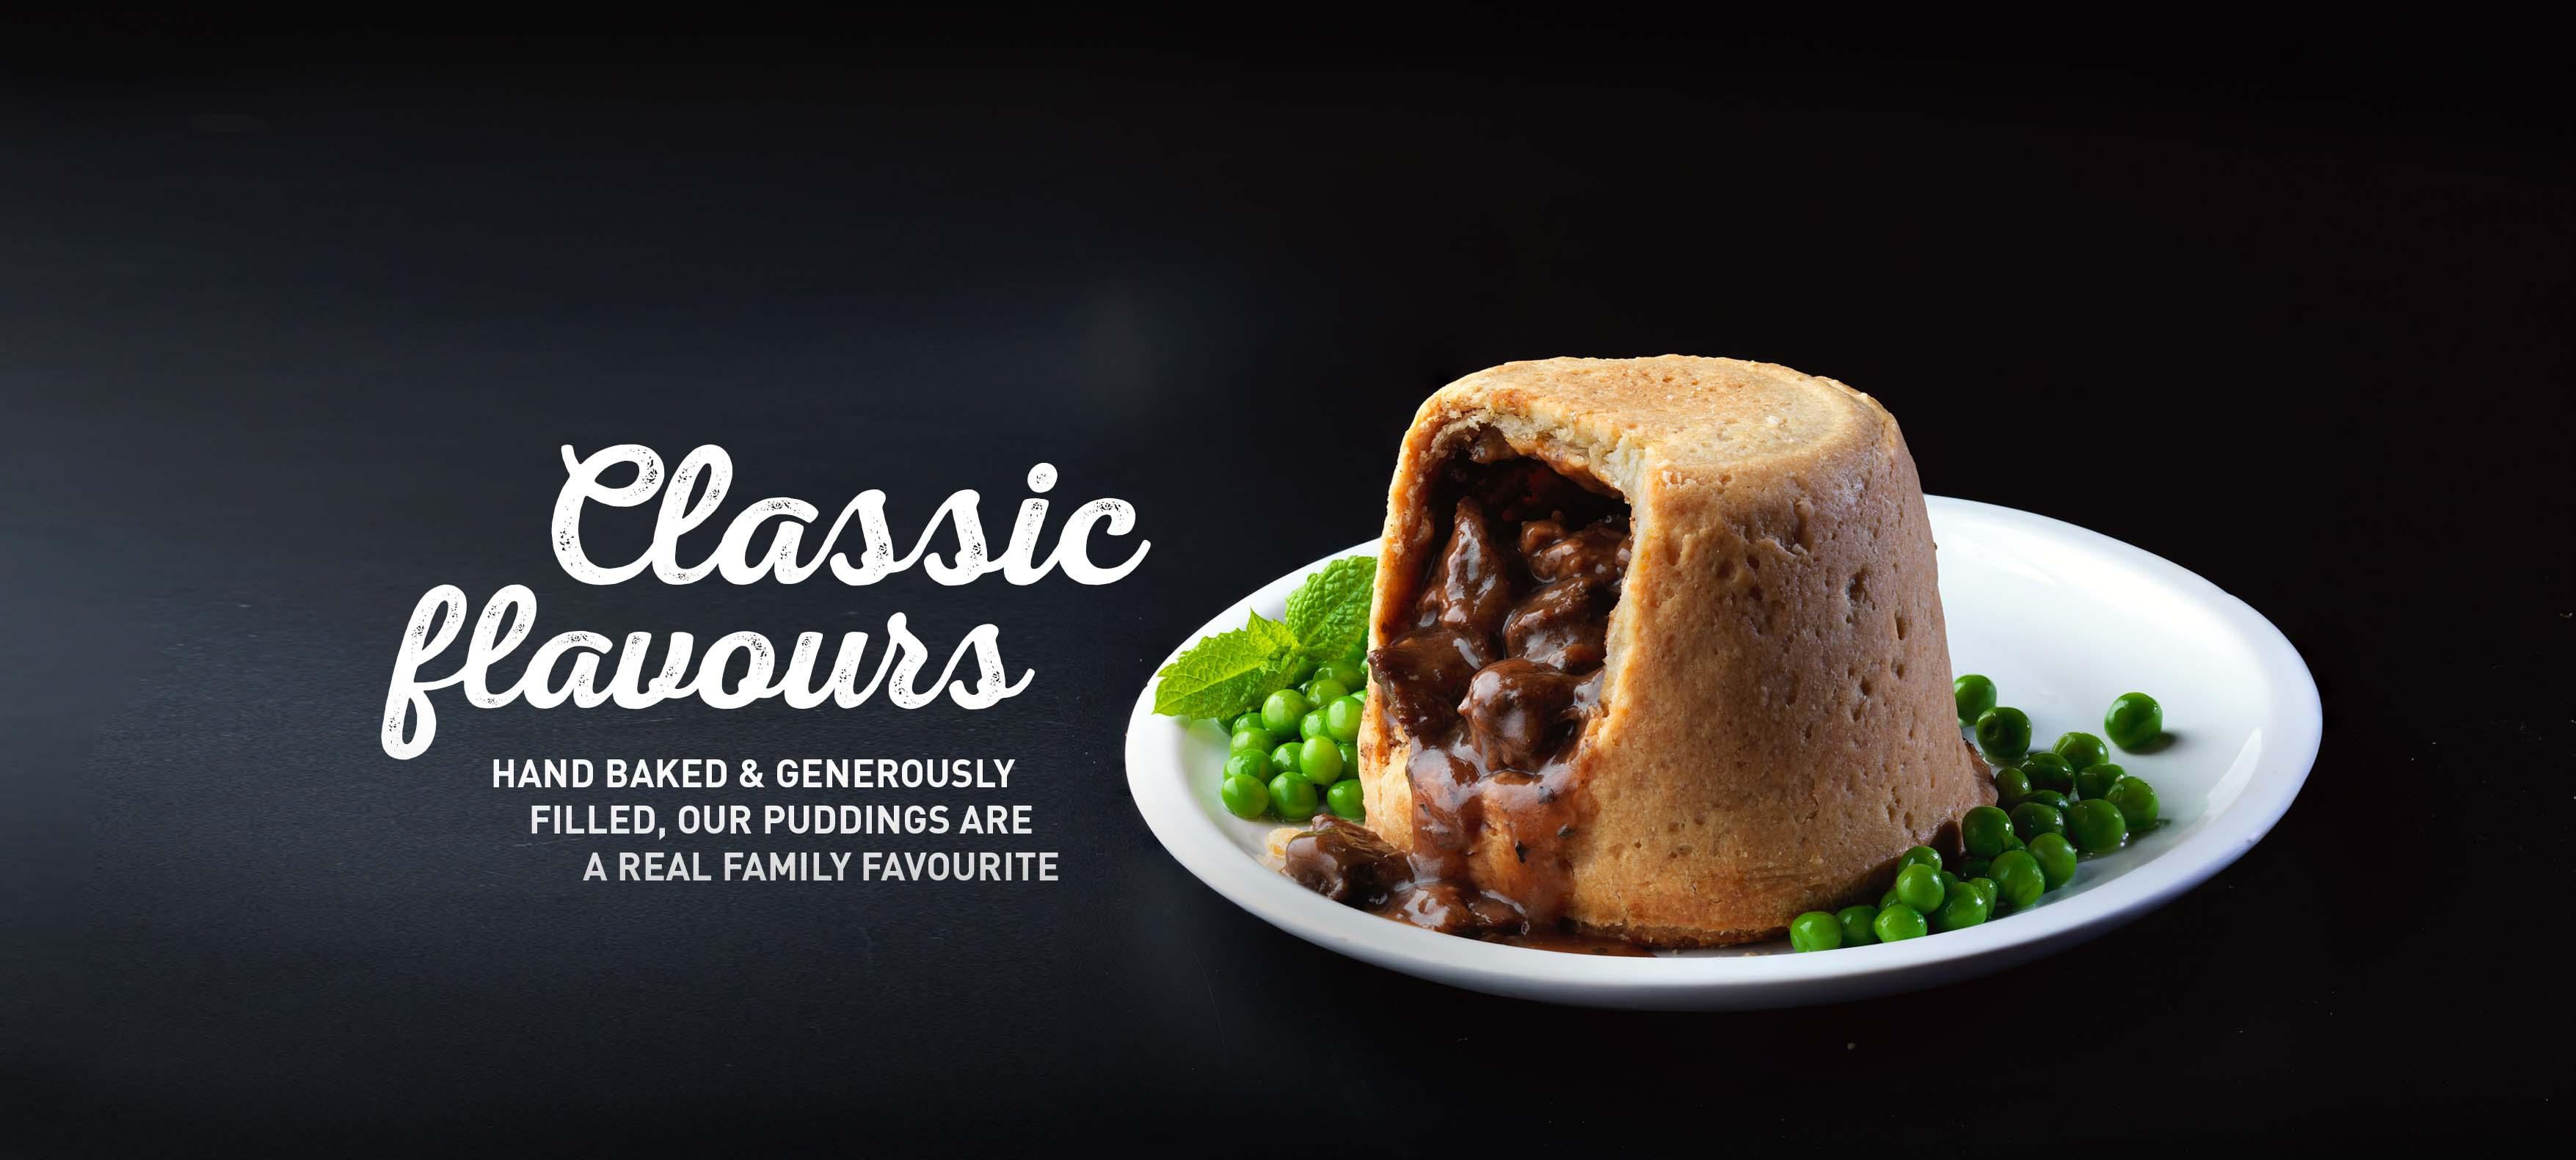 Steak & Kidney Pudding Home Shot - GBP